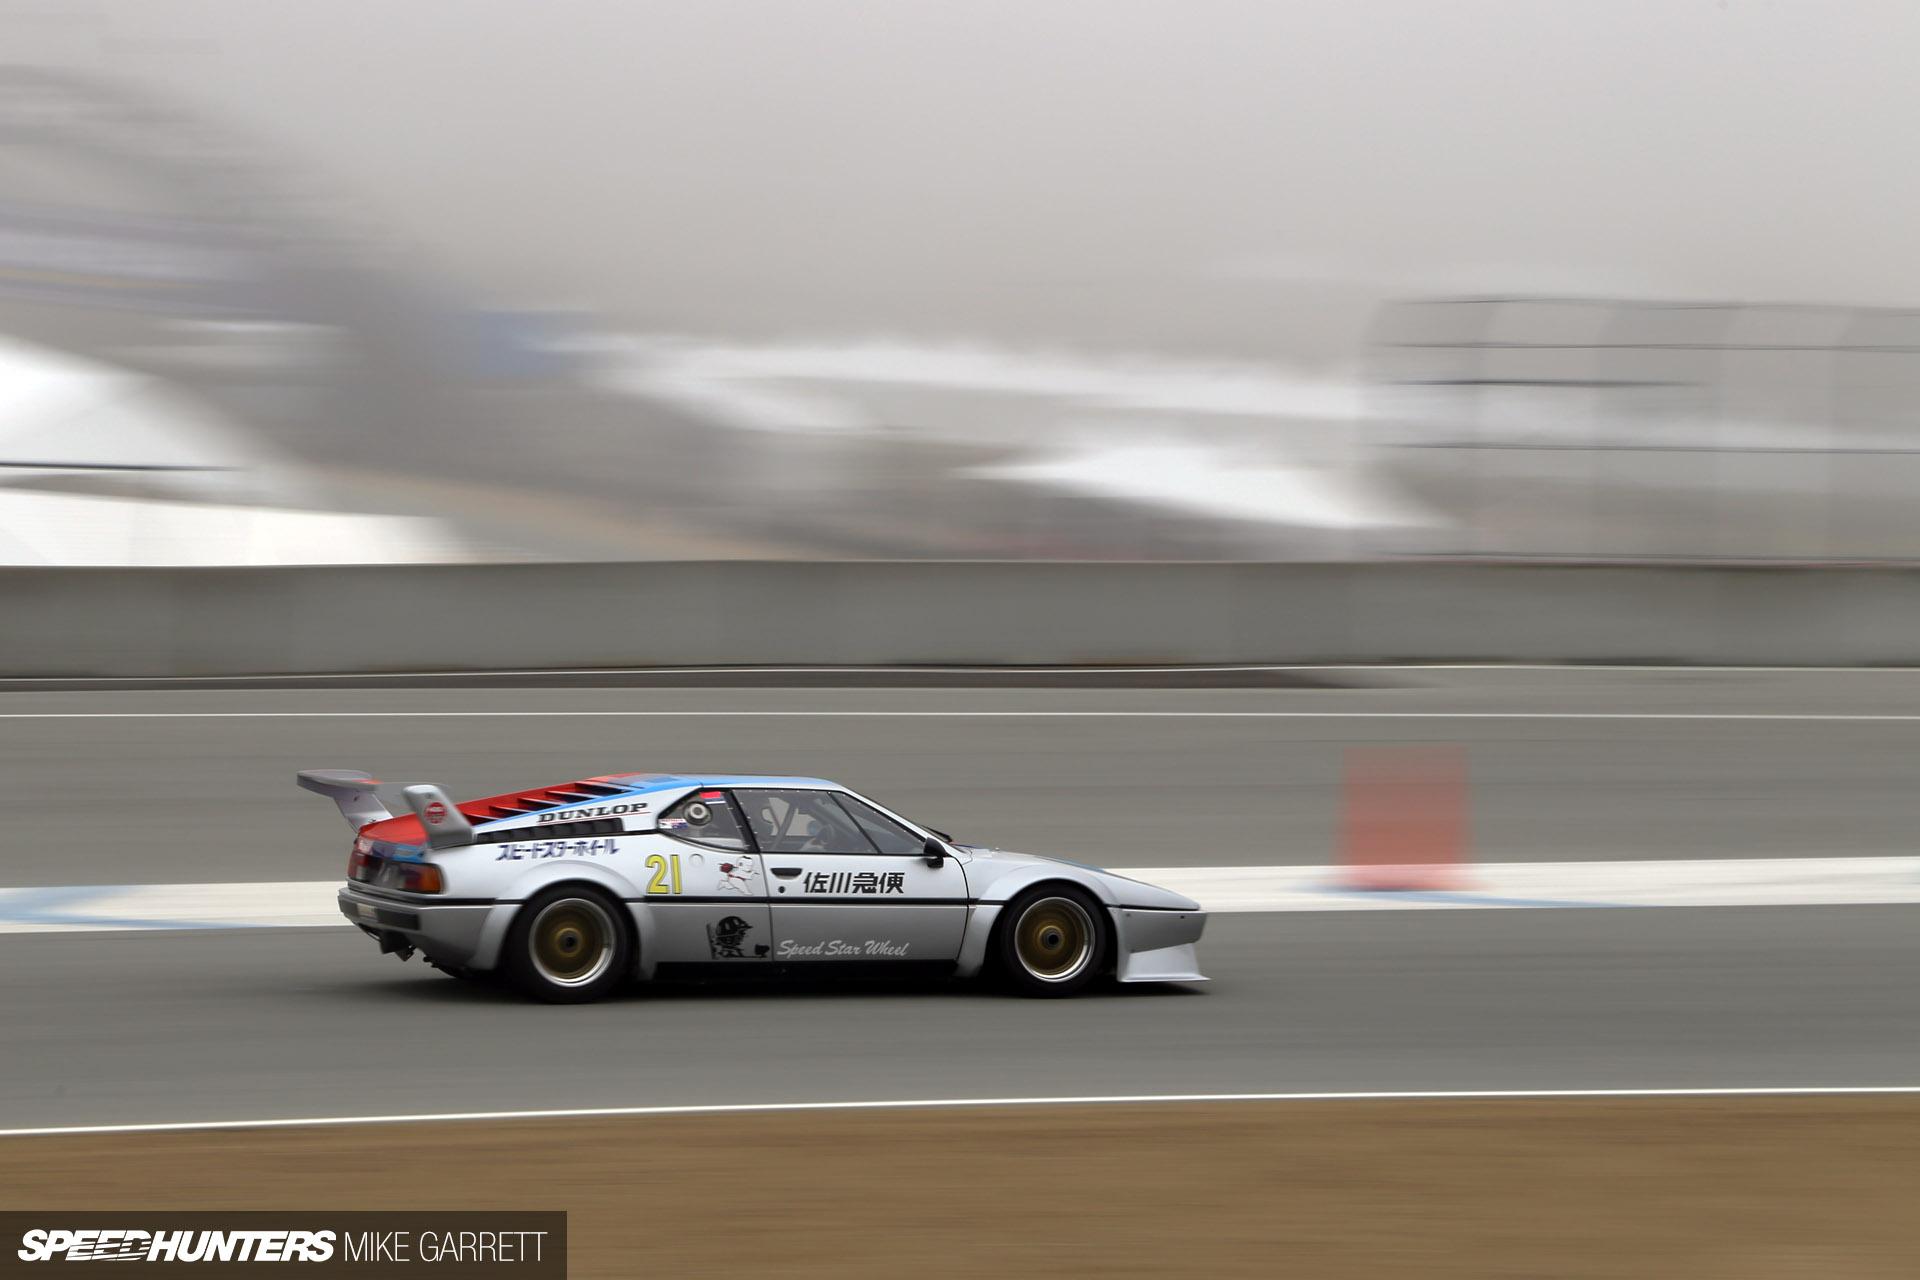 Japanese Legend: The Speed Star M1Procar